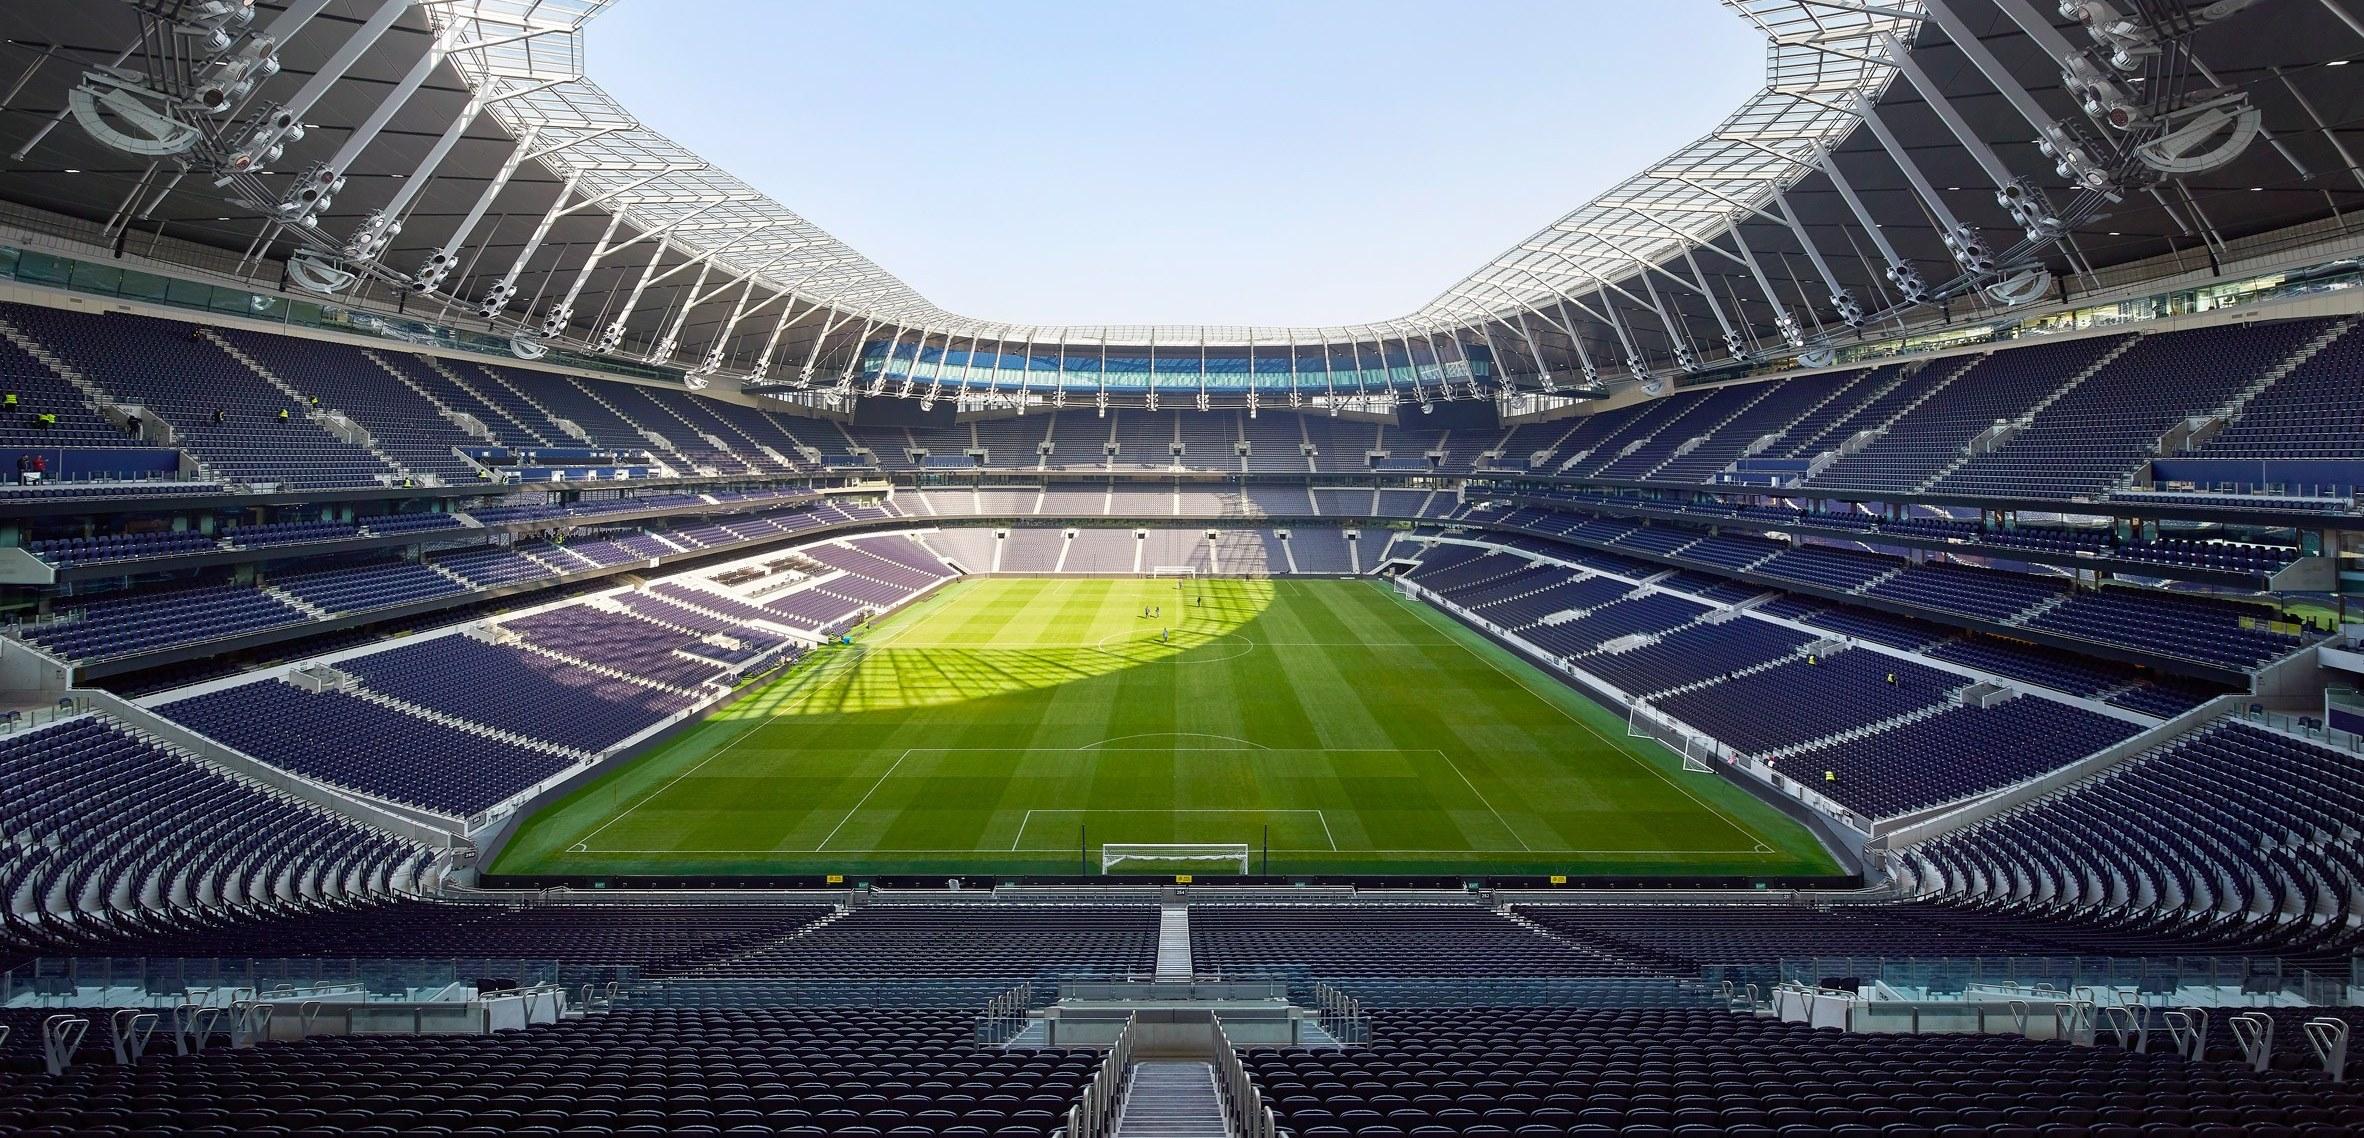 Tottenham Hotspur Vs Wolverhampton Wanderers At Tottenham Hotspur Stadium On 12 05 21 Wed 19 45 Football Ticket Net